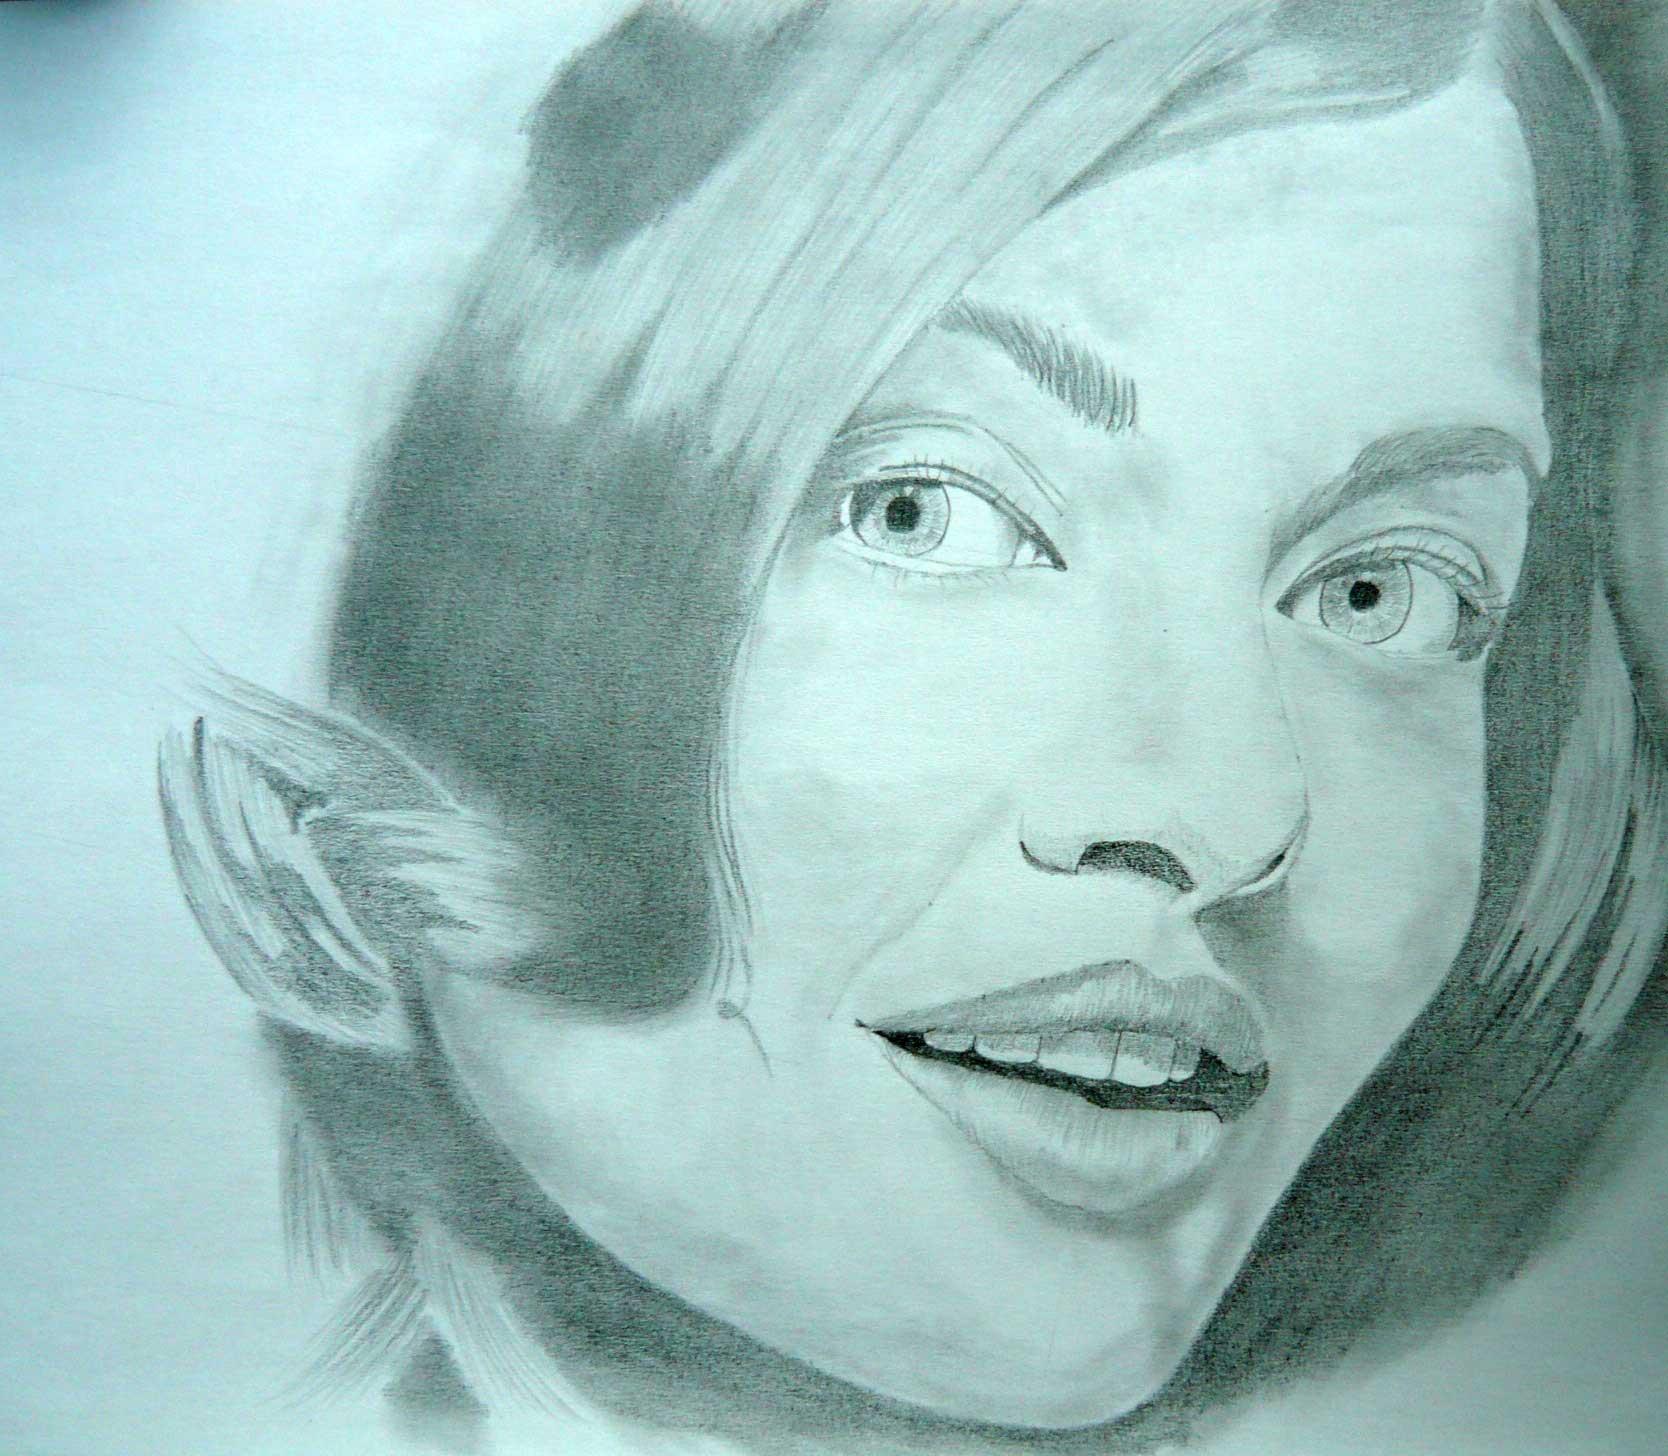 Naucte Se Kreslit Portret Tuzkou Kurz Pro Zacatecniky